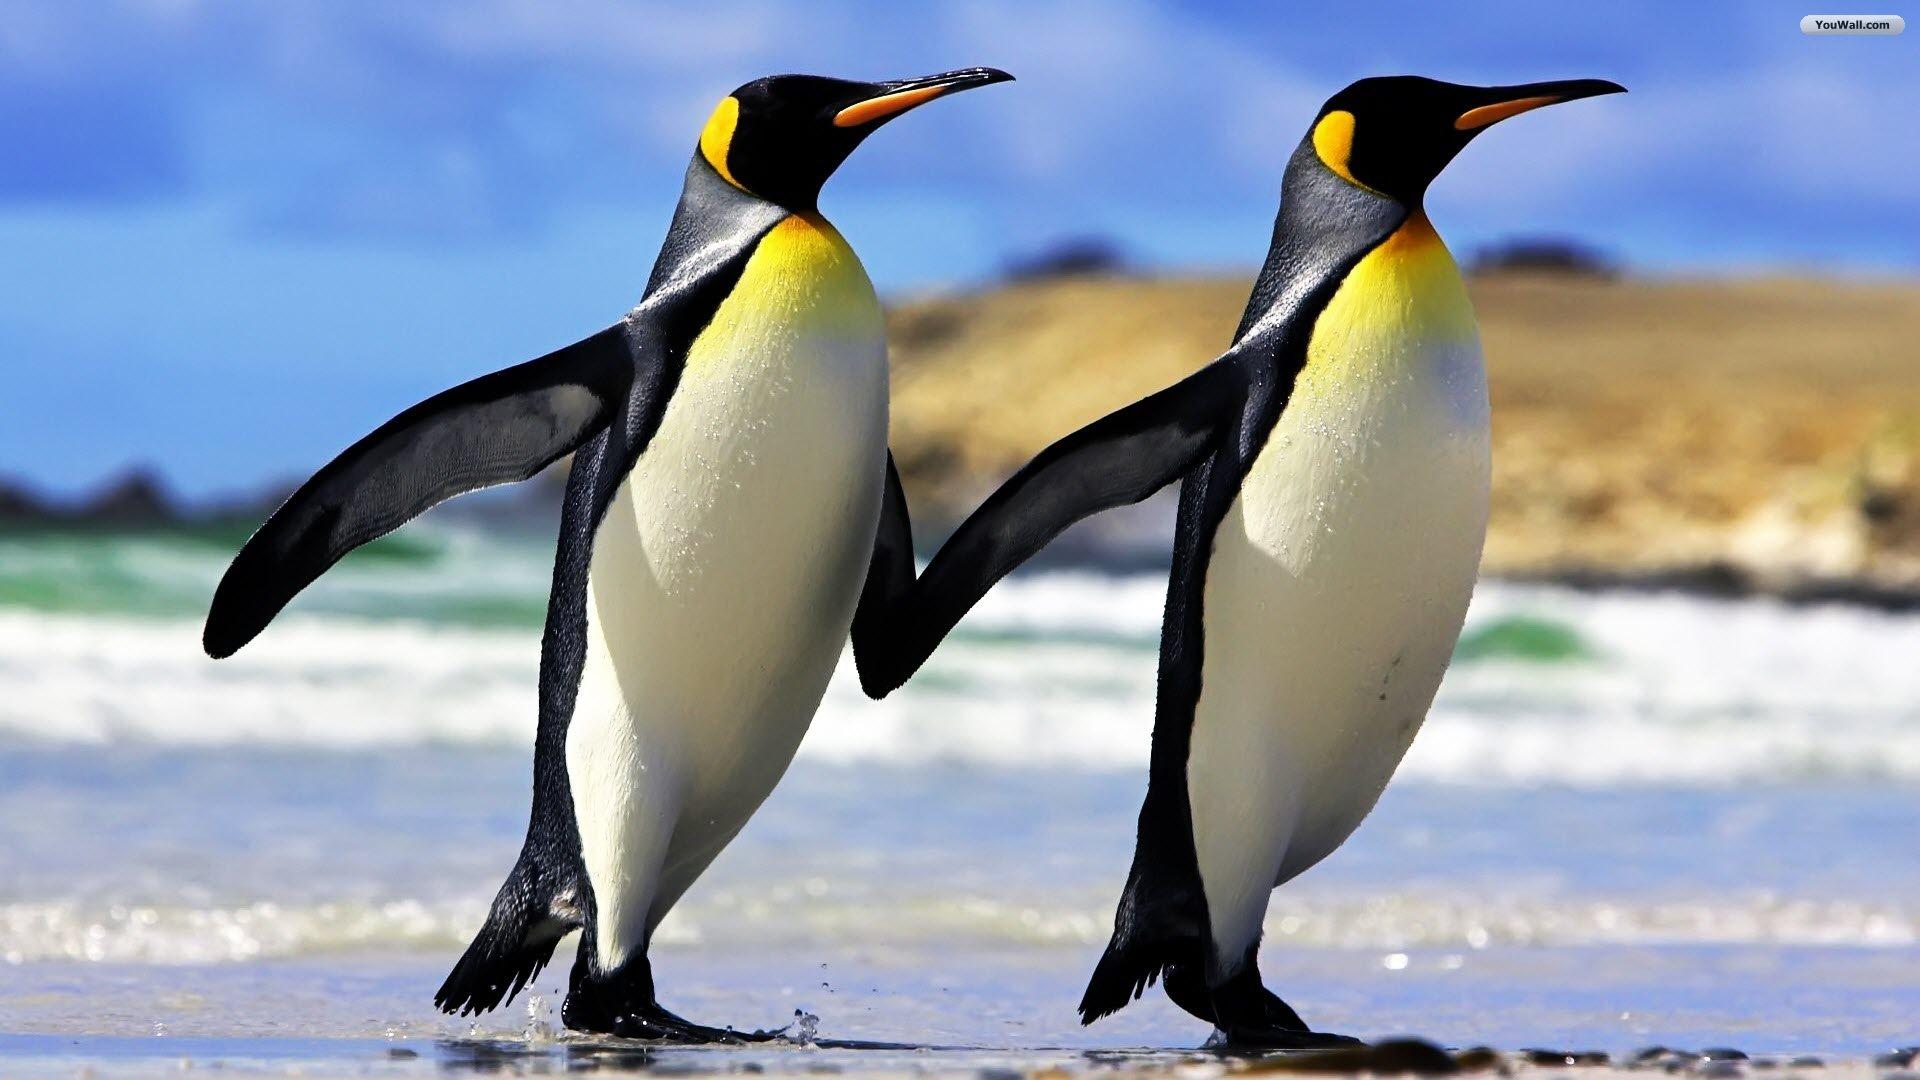 Emperor penguin beak